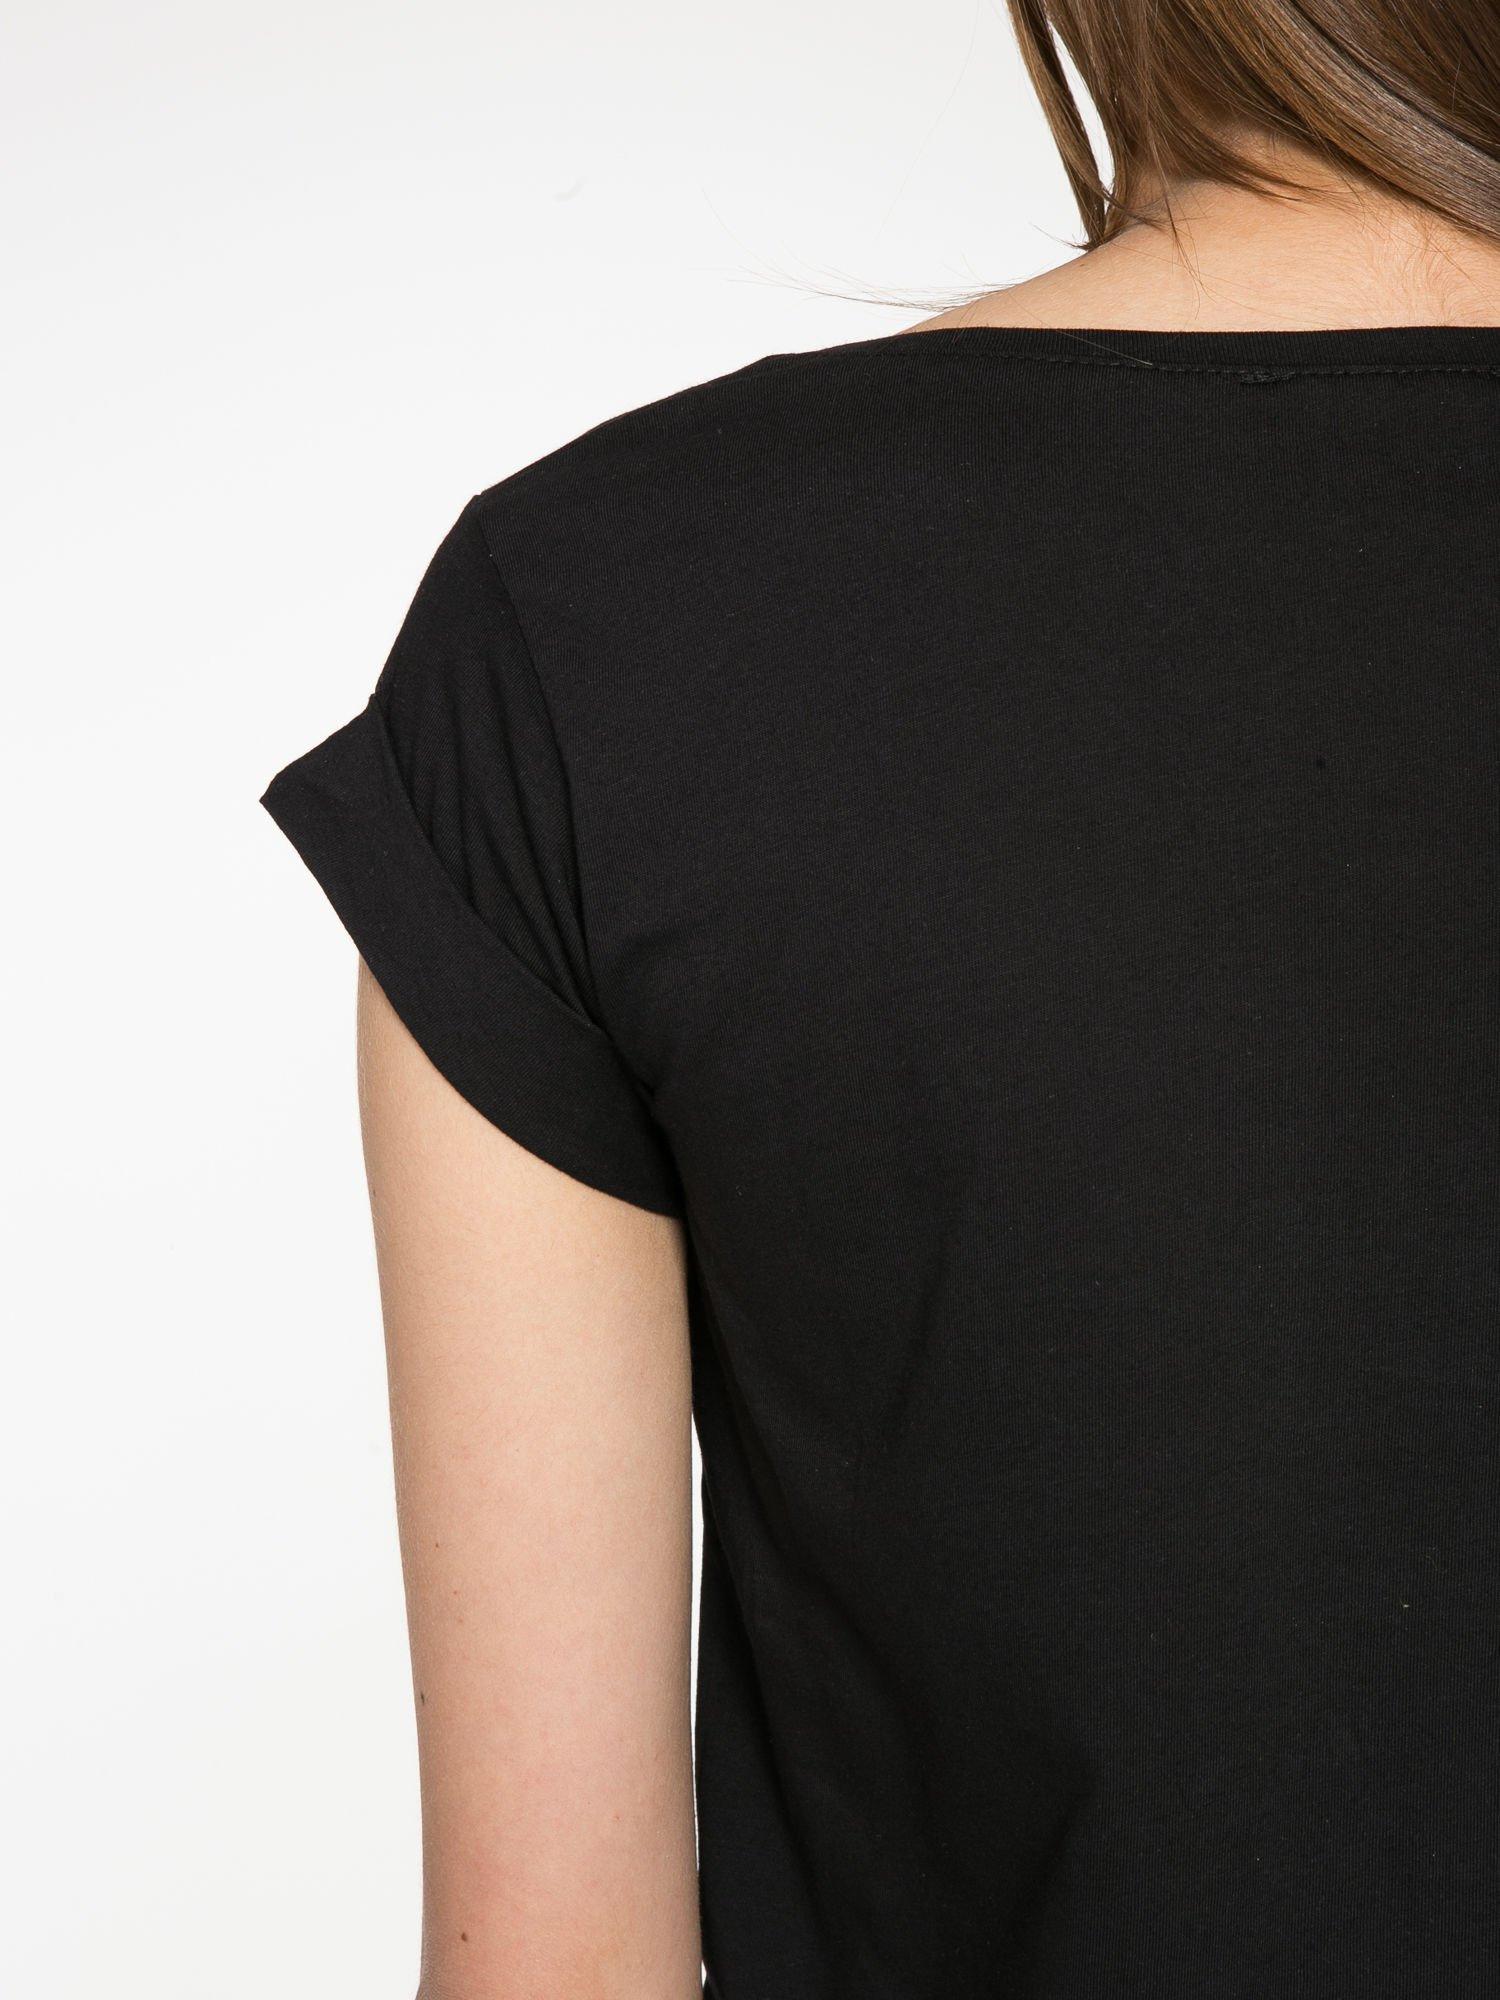 Czarny krótki t-shirt z nadrukiem stokrotek i napisem                                  zdj.                                  10